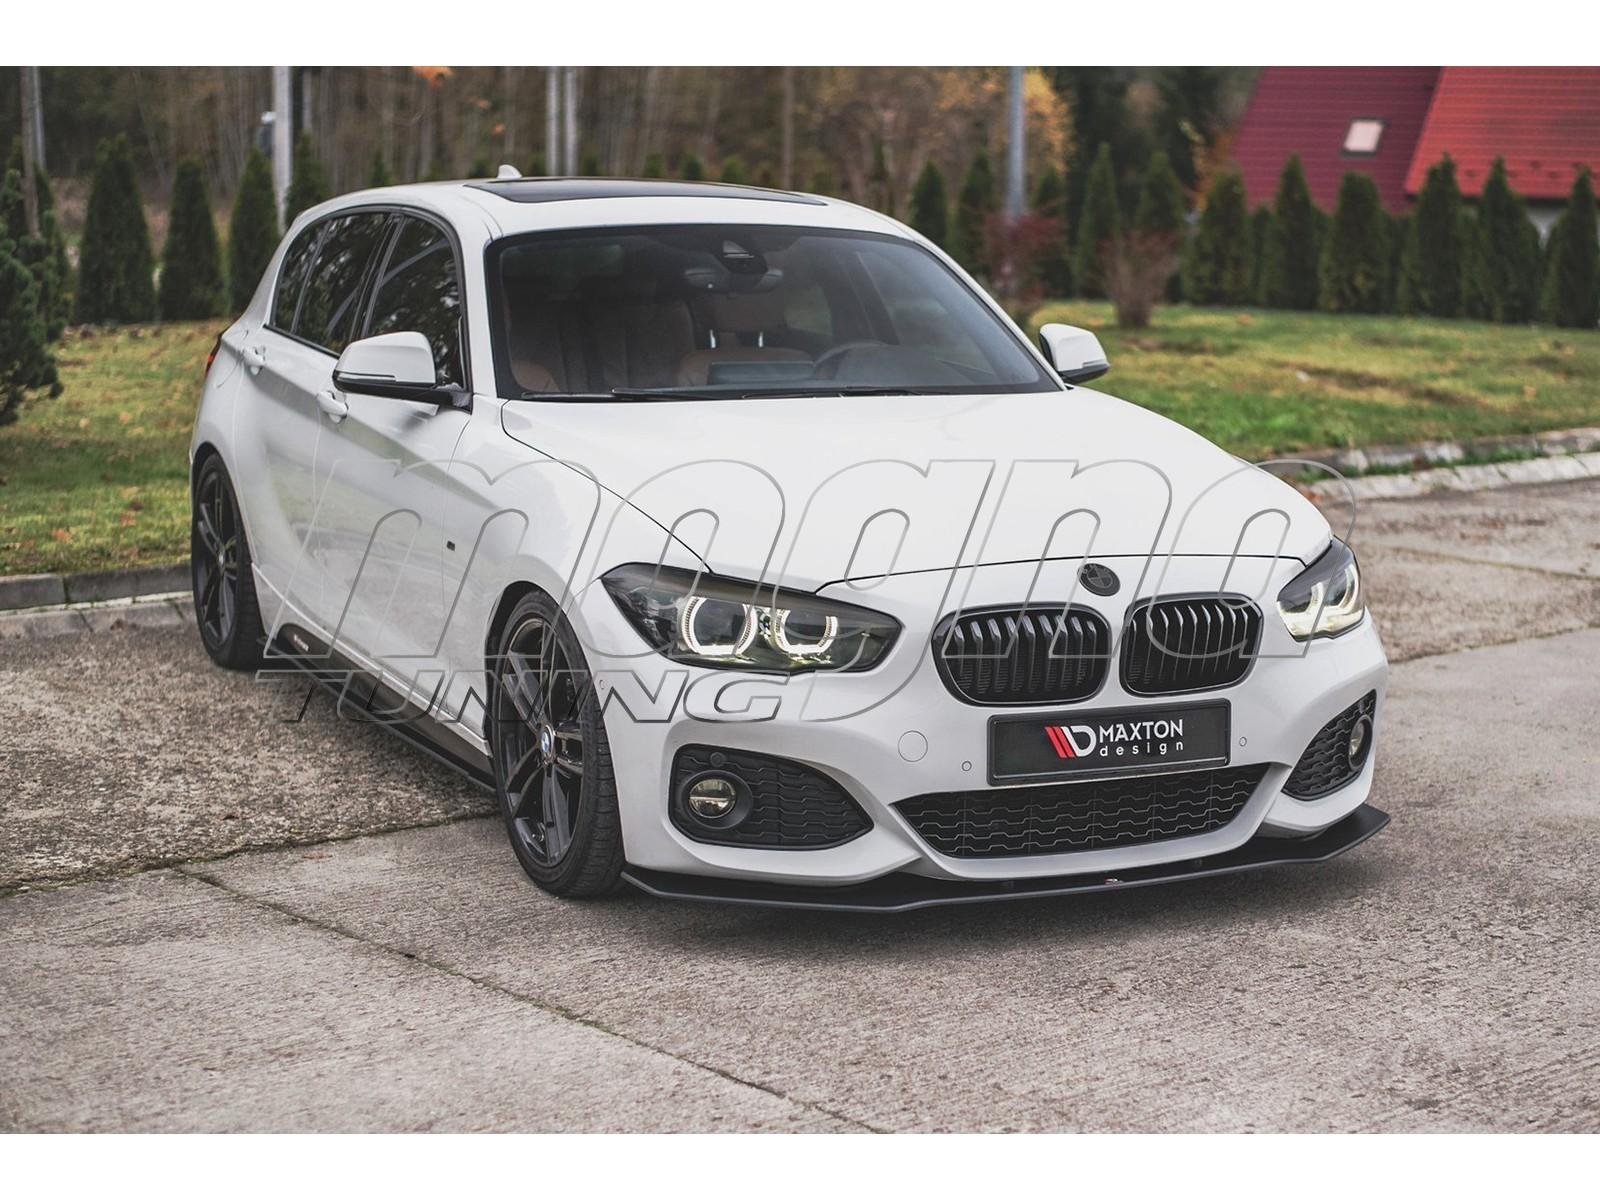 BMW F20 / F21 Facelift Matrix Body Kit